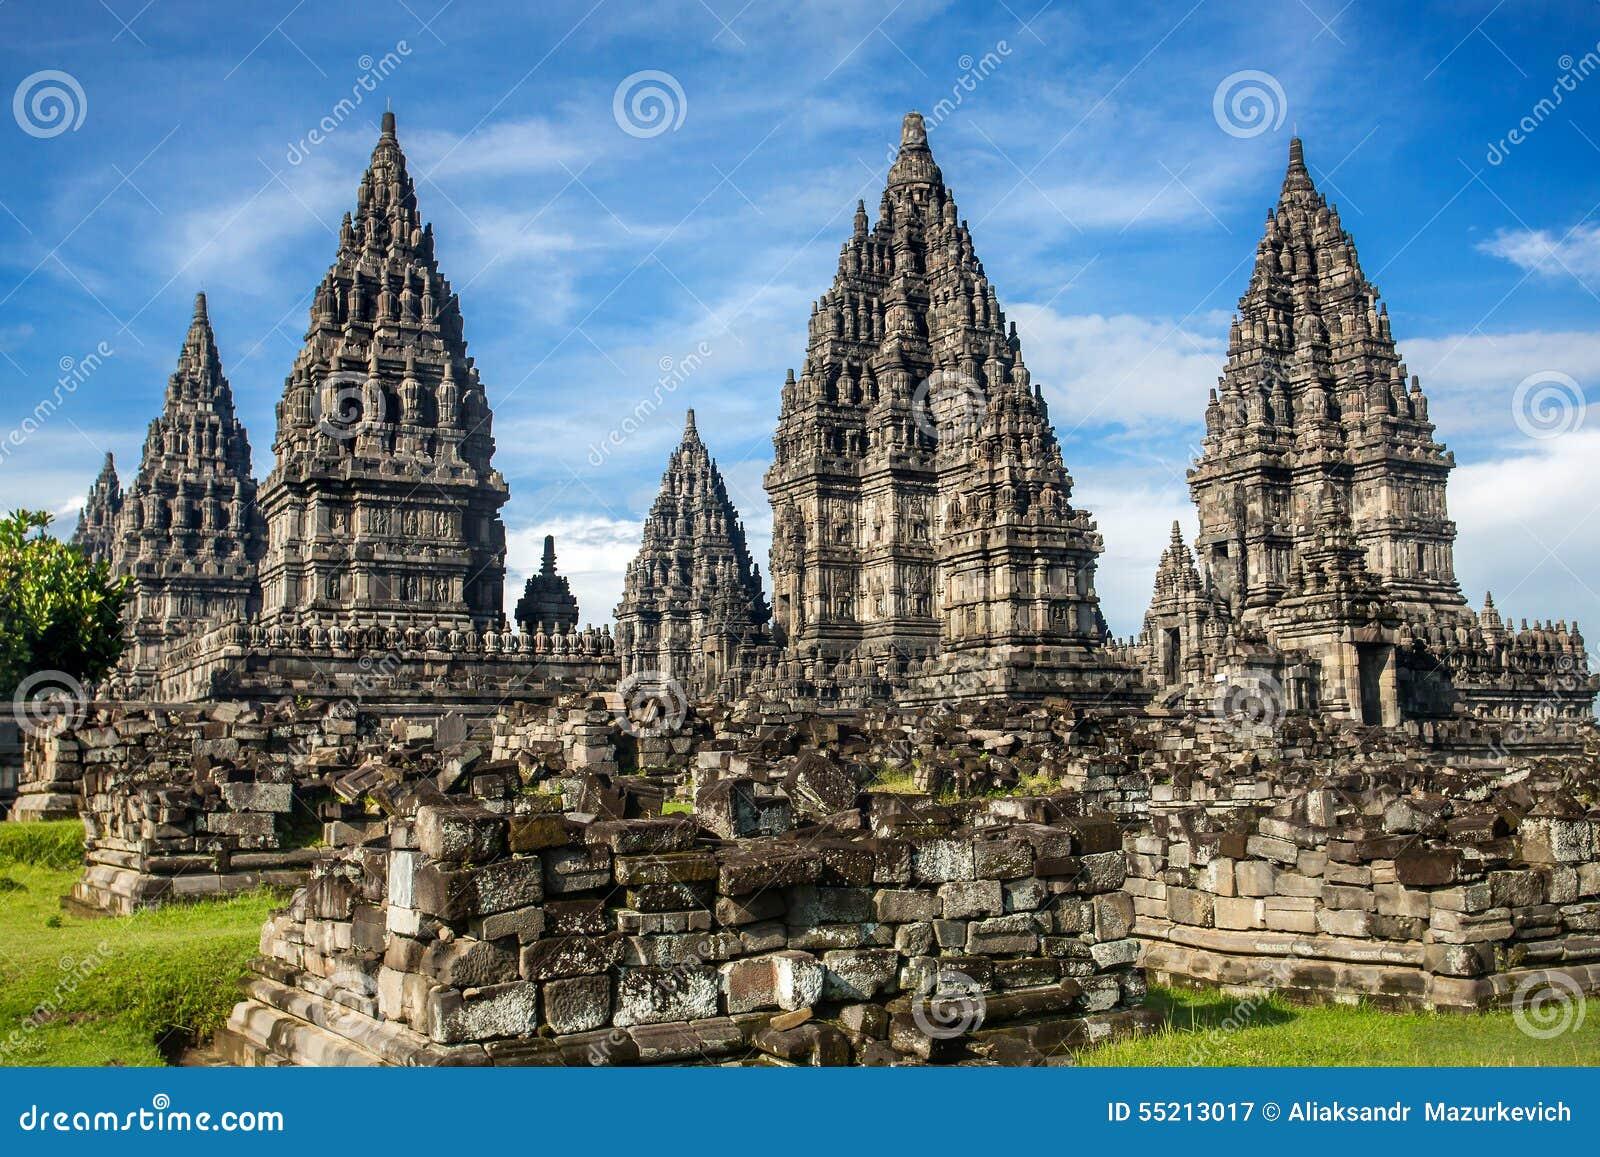 Prambanantempel dichtbij Yogyakarta, Java, Indonesië